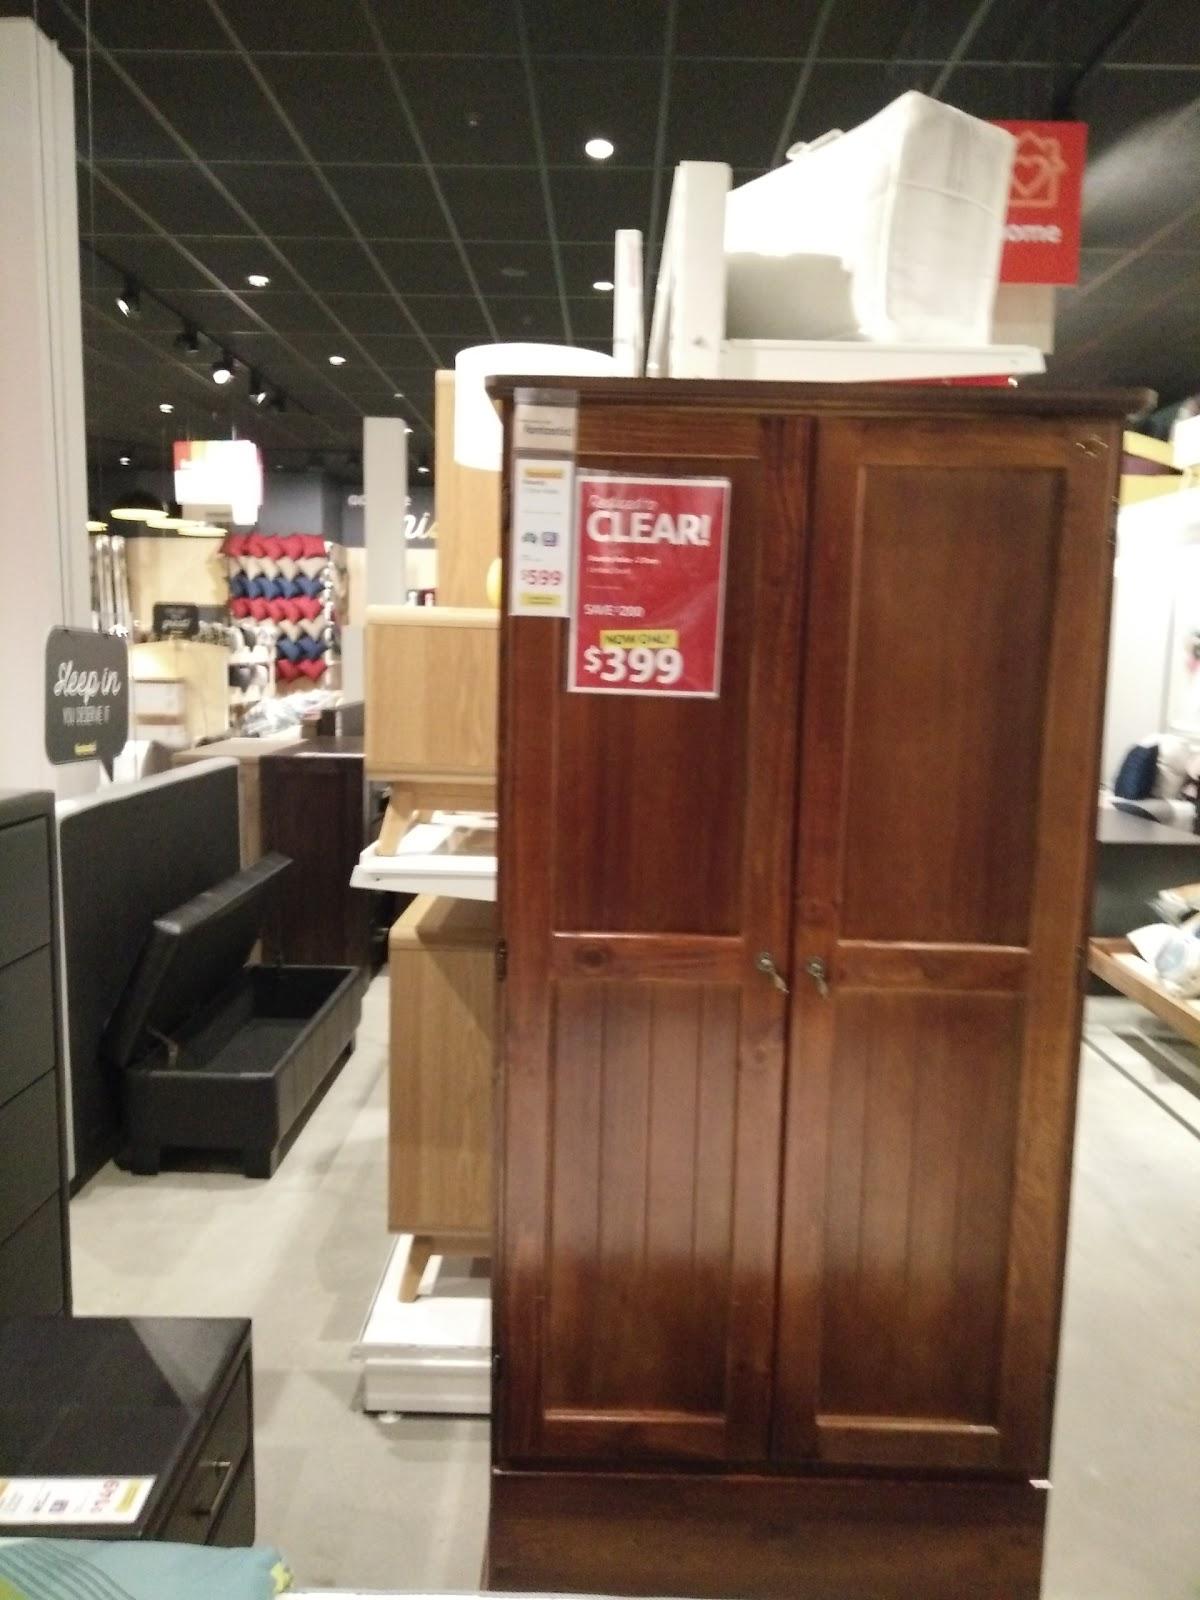 FANTASTIC FURNITURE KENSINGTON NSW Merchant details  Fantastic Furniture  Locations Nsw Kisekae Rakuen com. Does Fantastic Furniture Delivery   kalecelikkapi24 com